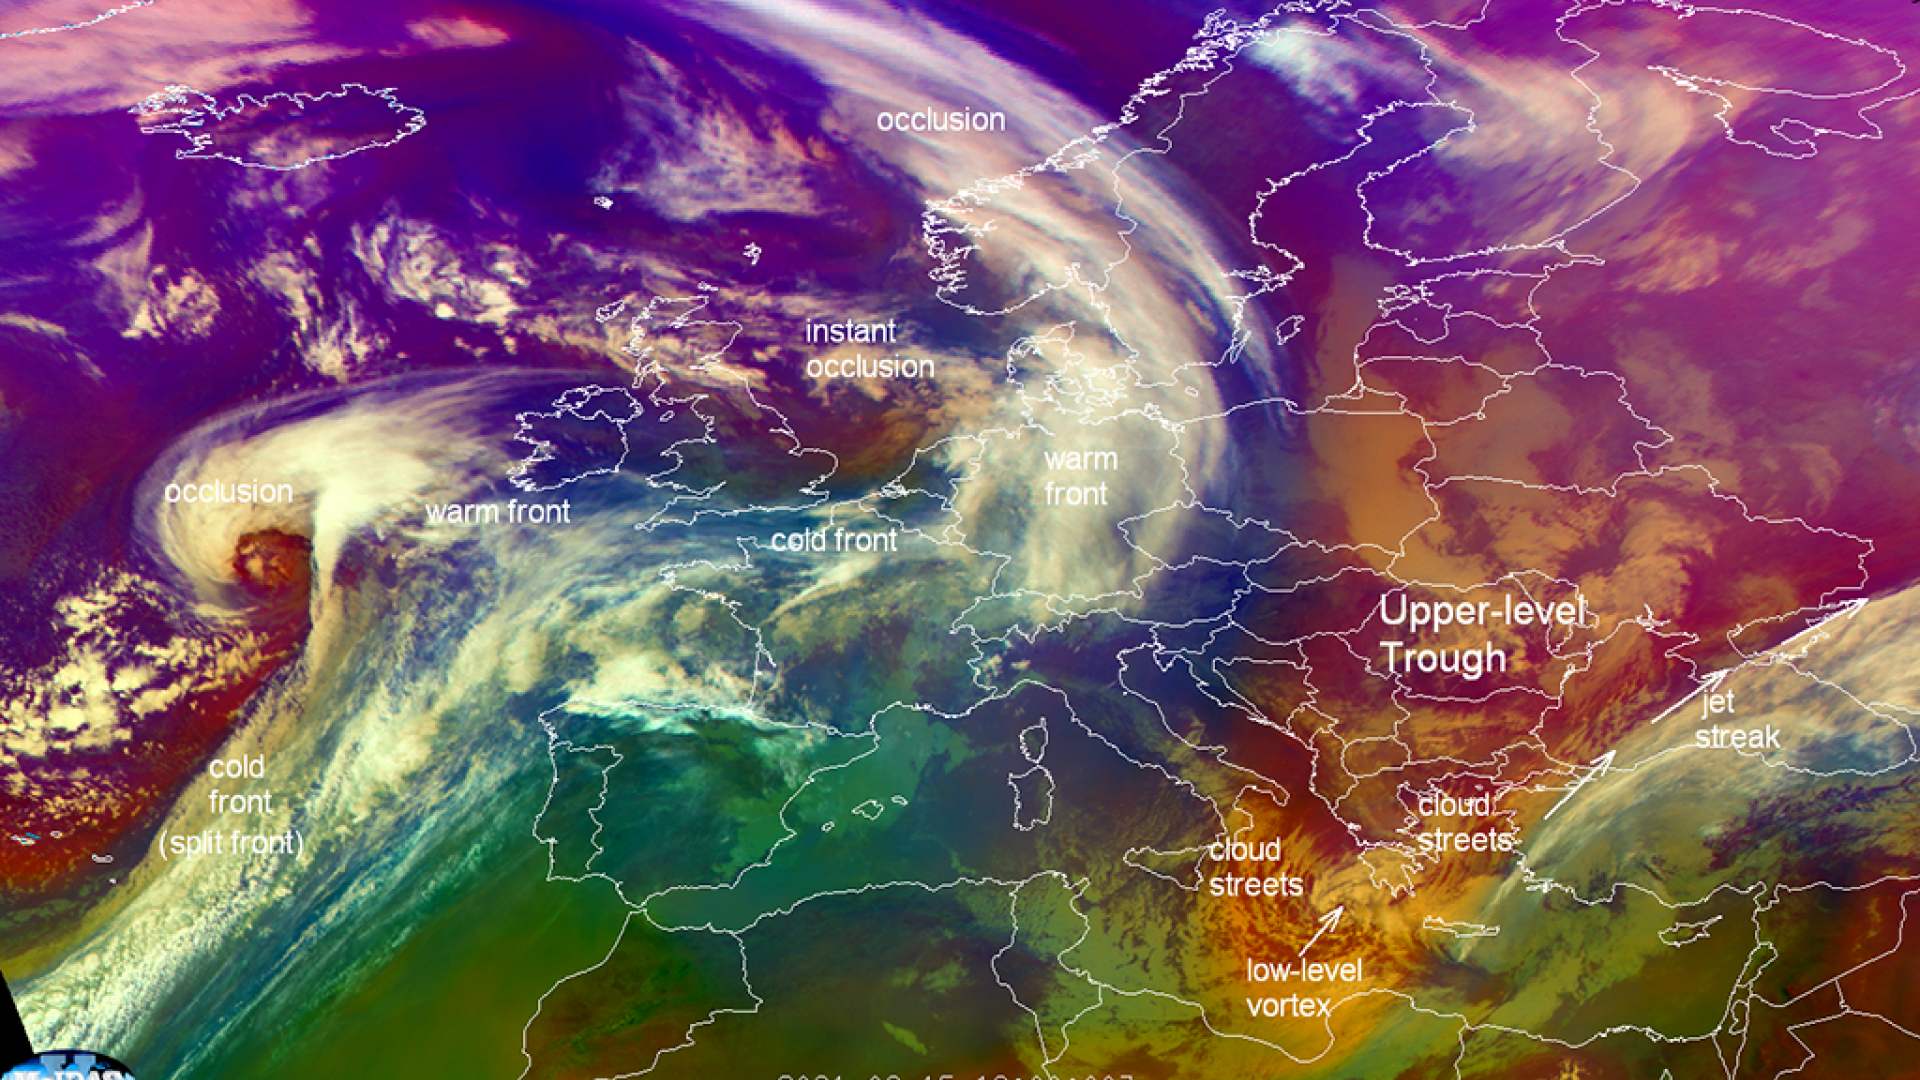 Met-11 Airmass RGB, 15 Feb 2021, annotated